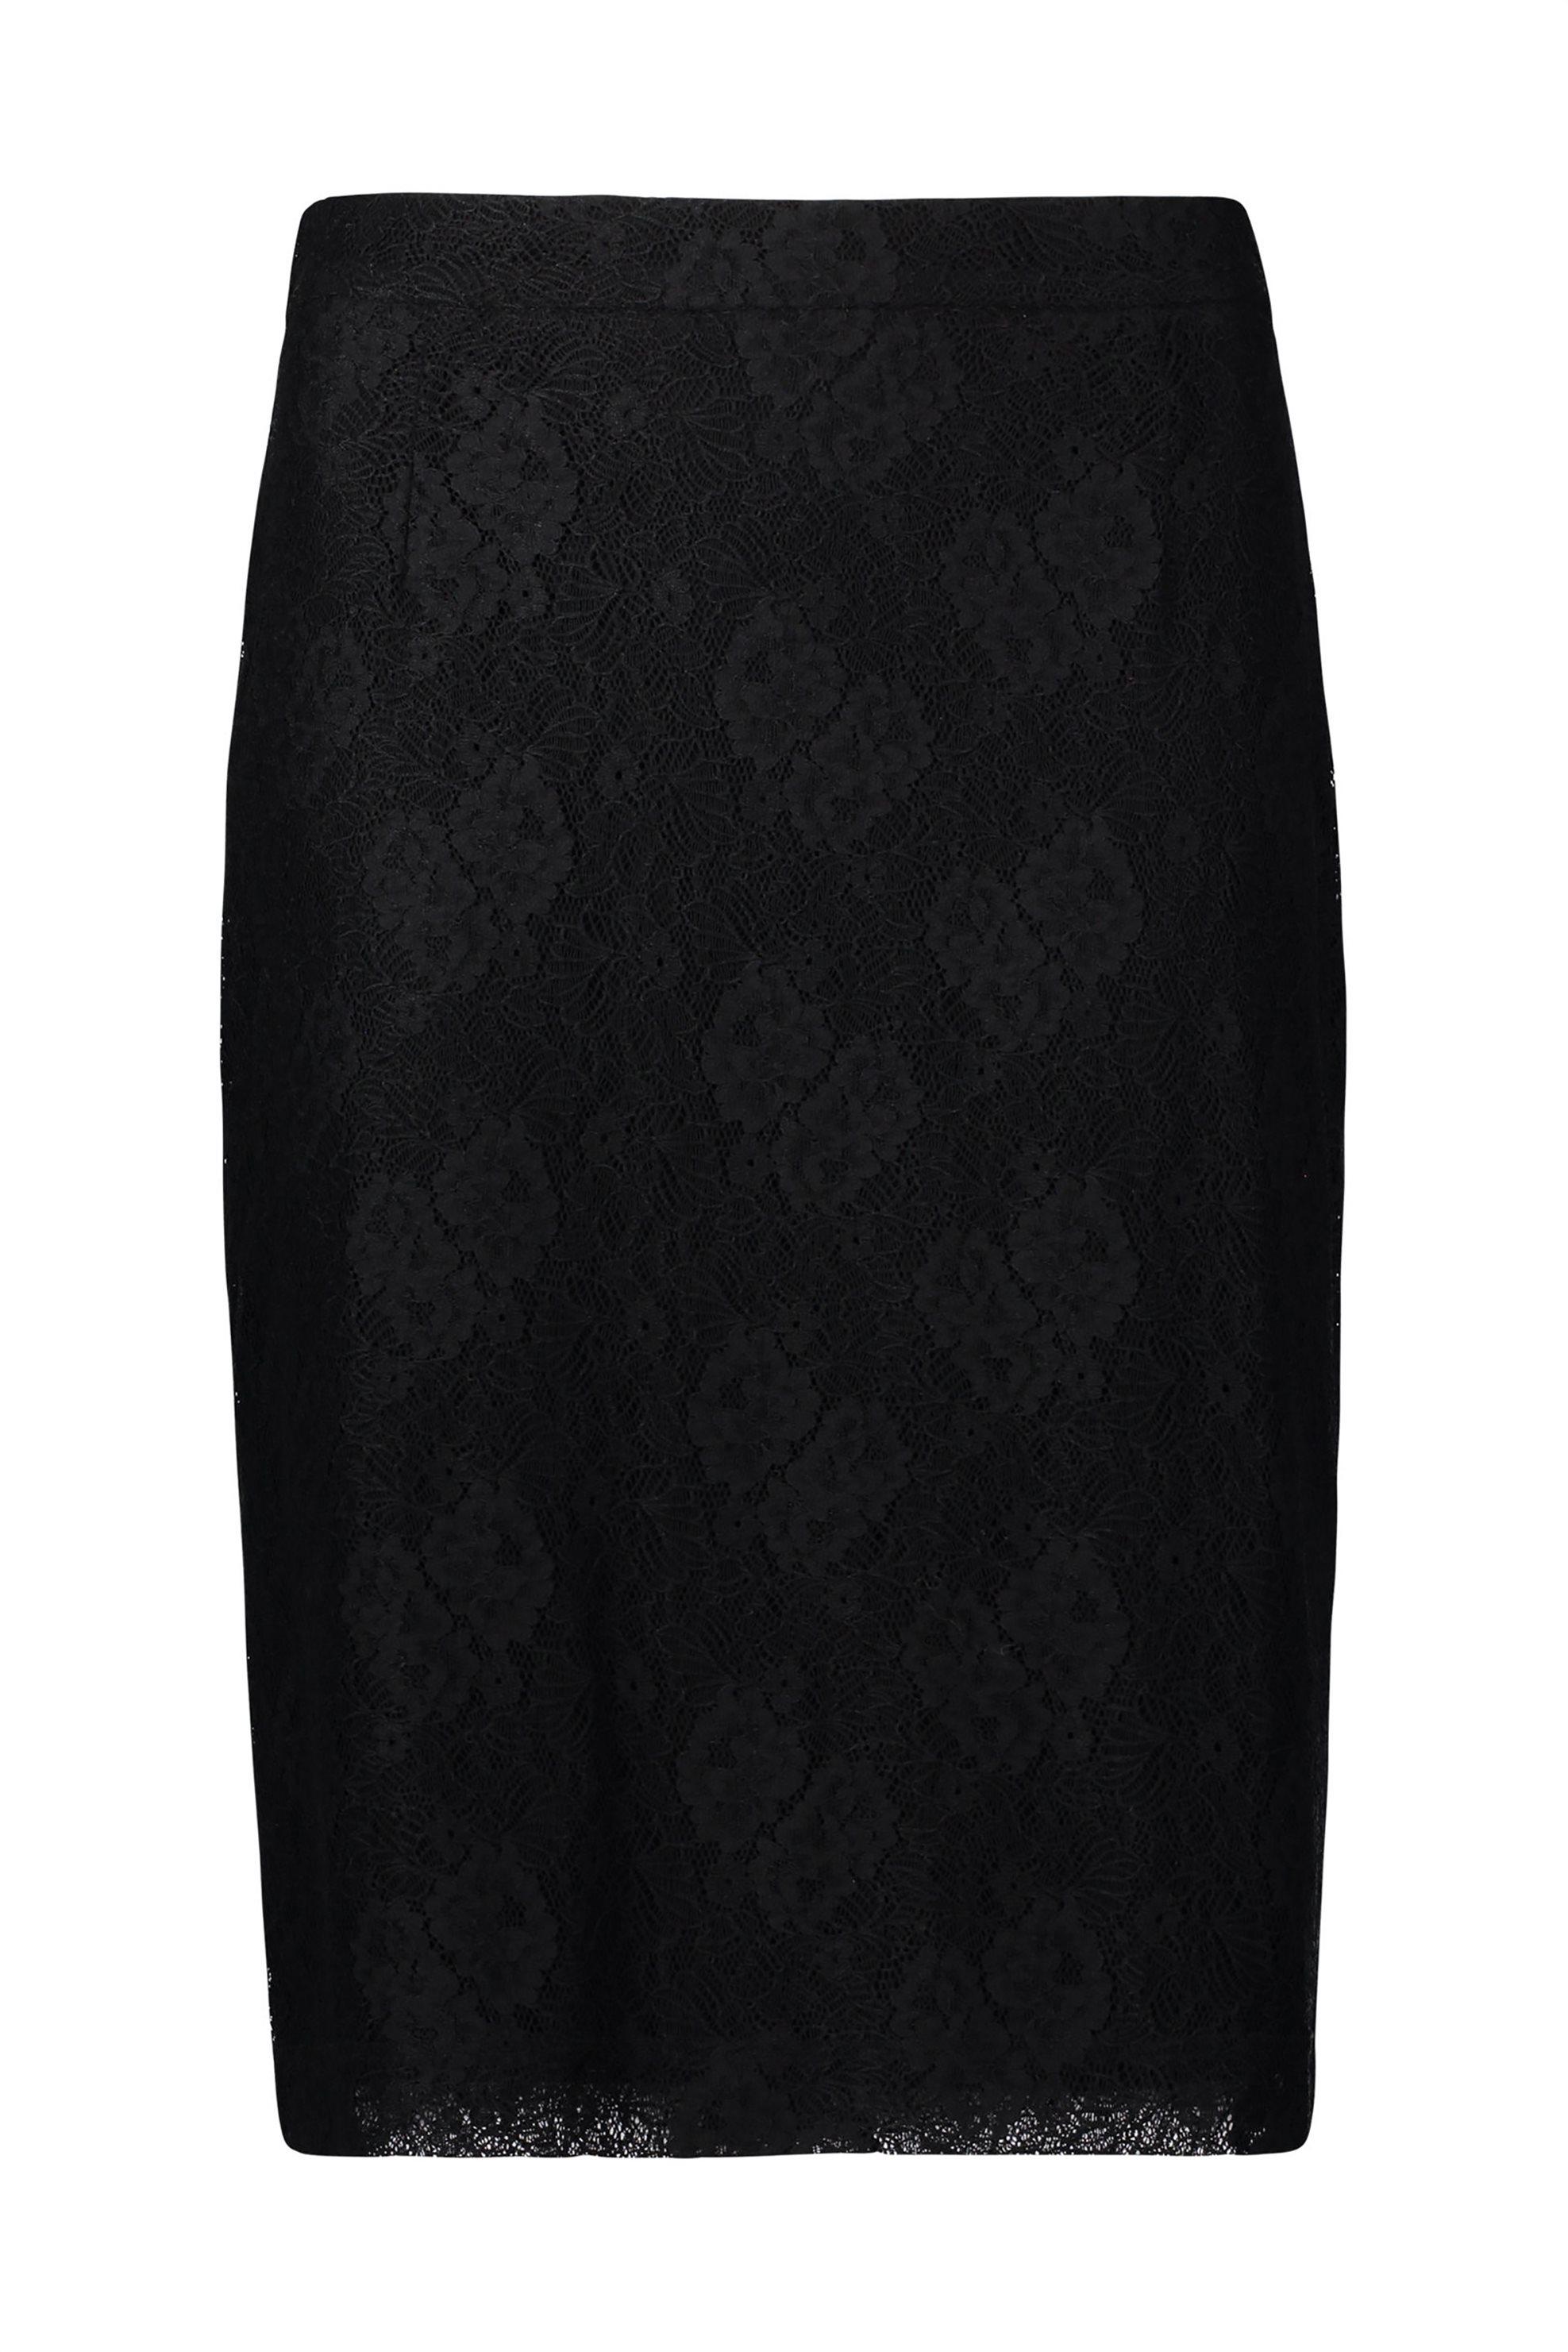 BETTY & CO Γυναικεία Φούστα Pencil Από Δαντέλα - 3353/3009 - Μαύρο